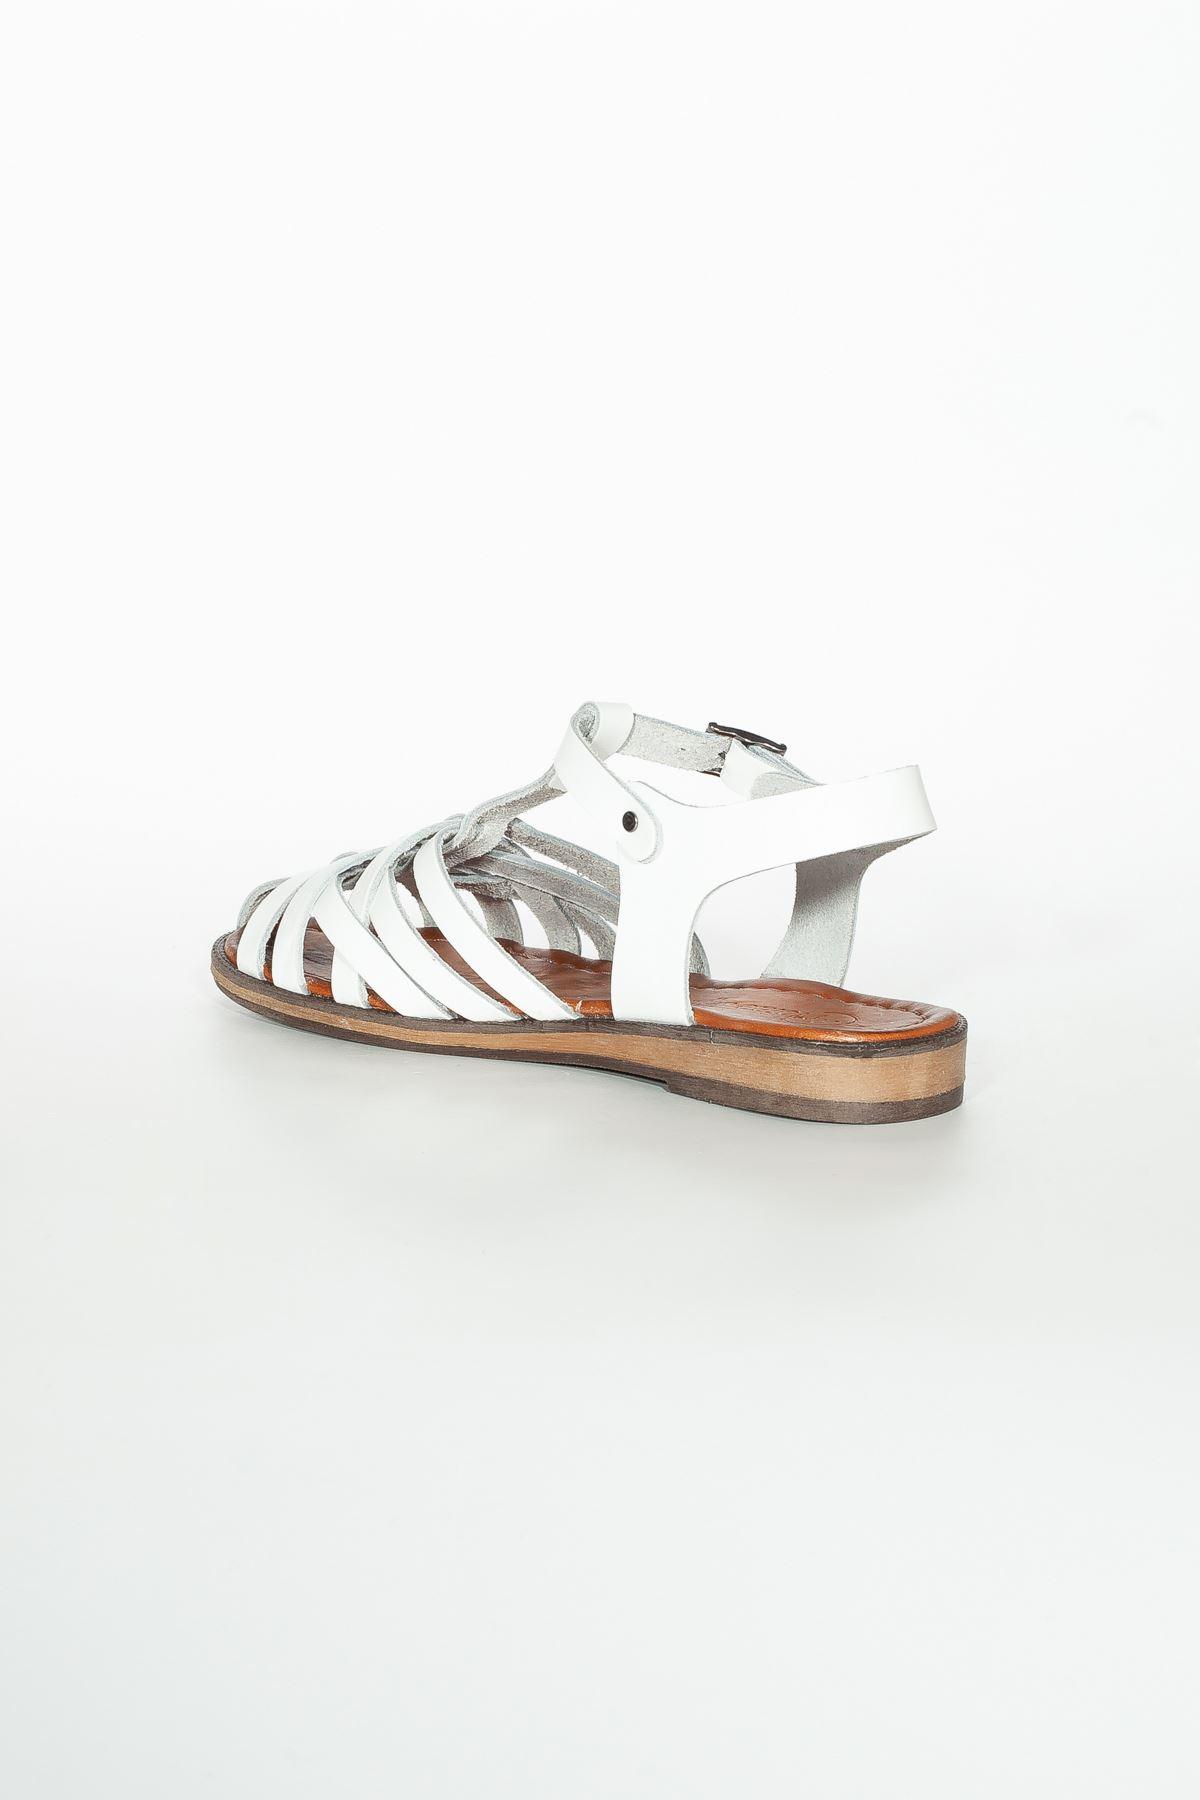 Rabee RT3081 Beyaz  Bayan Hakiki Deri Sandalet